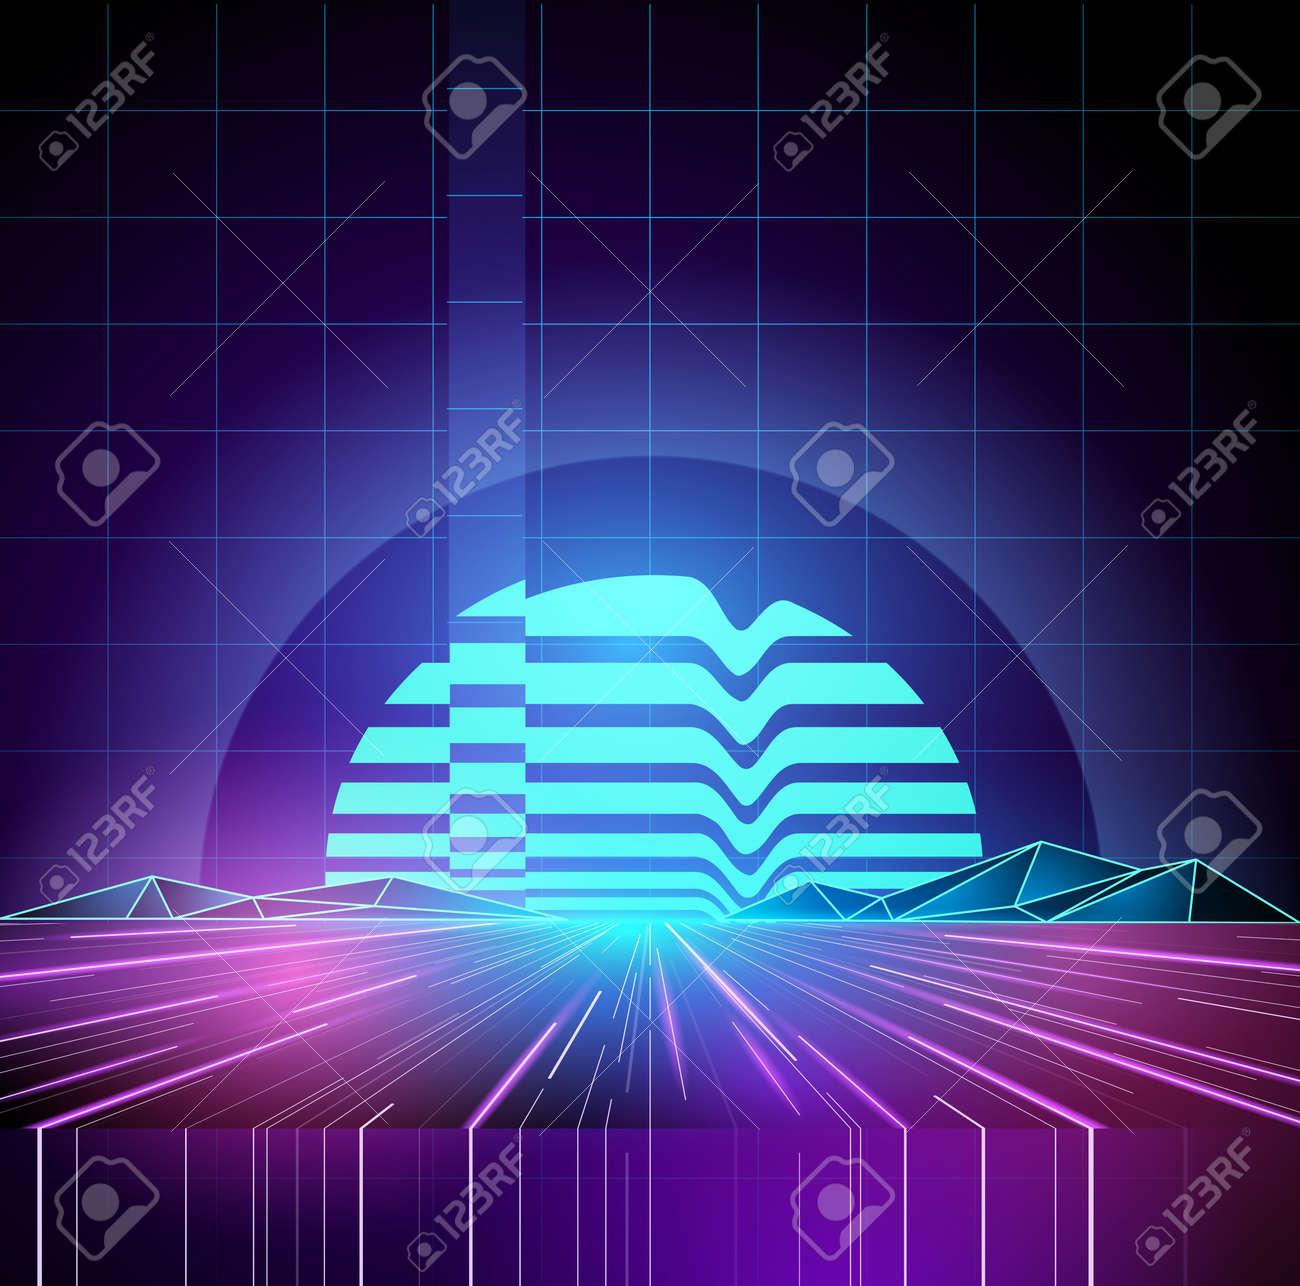 Retro 1980s Neon future background horizon. Vector illustration - 72483345